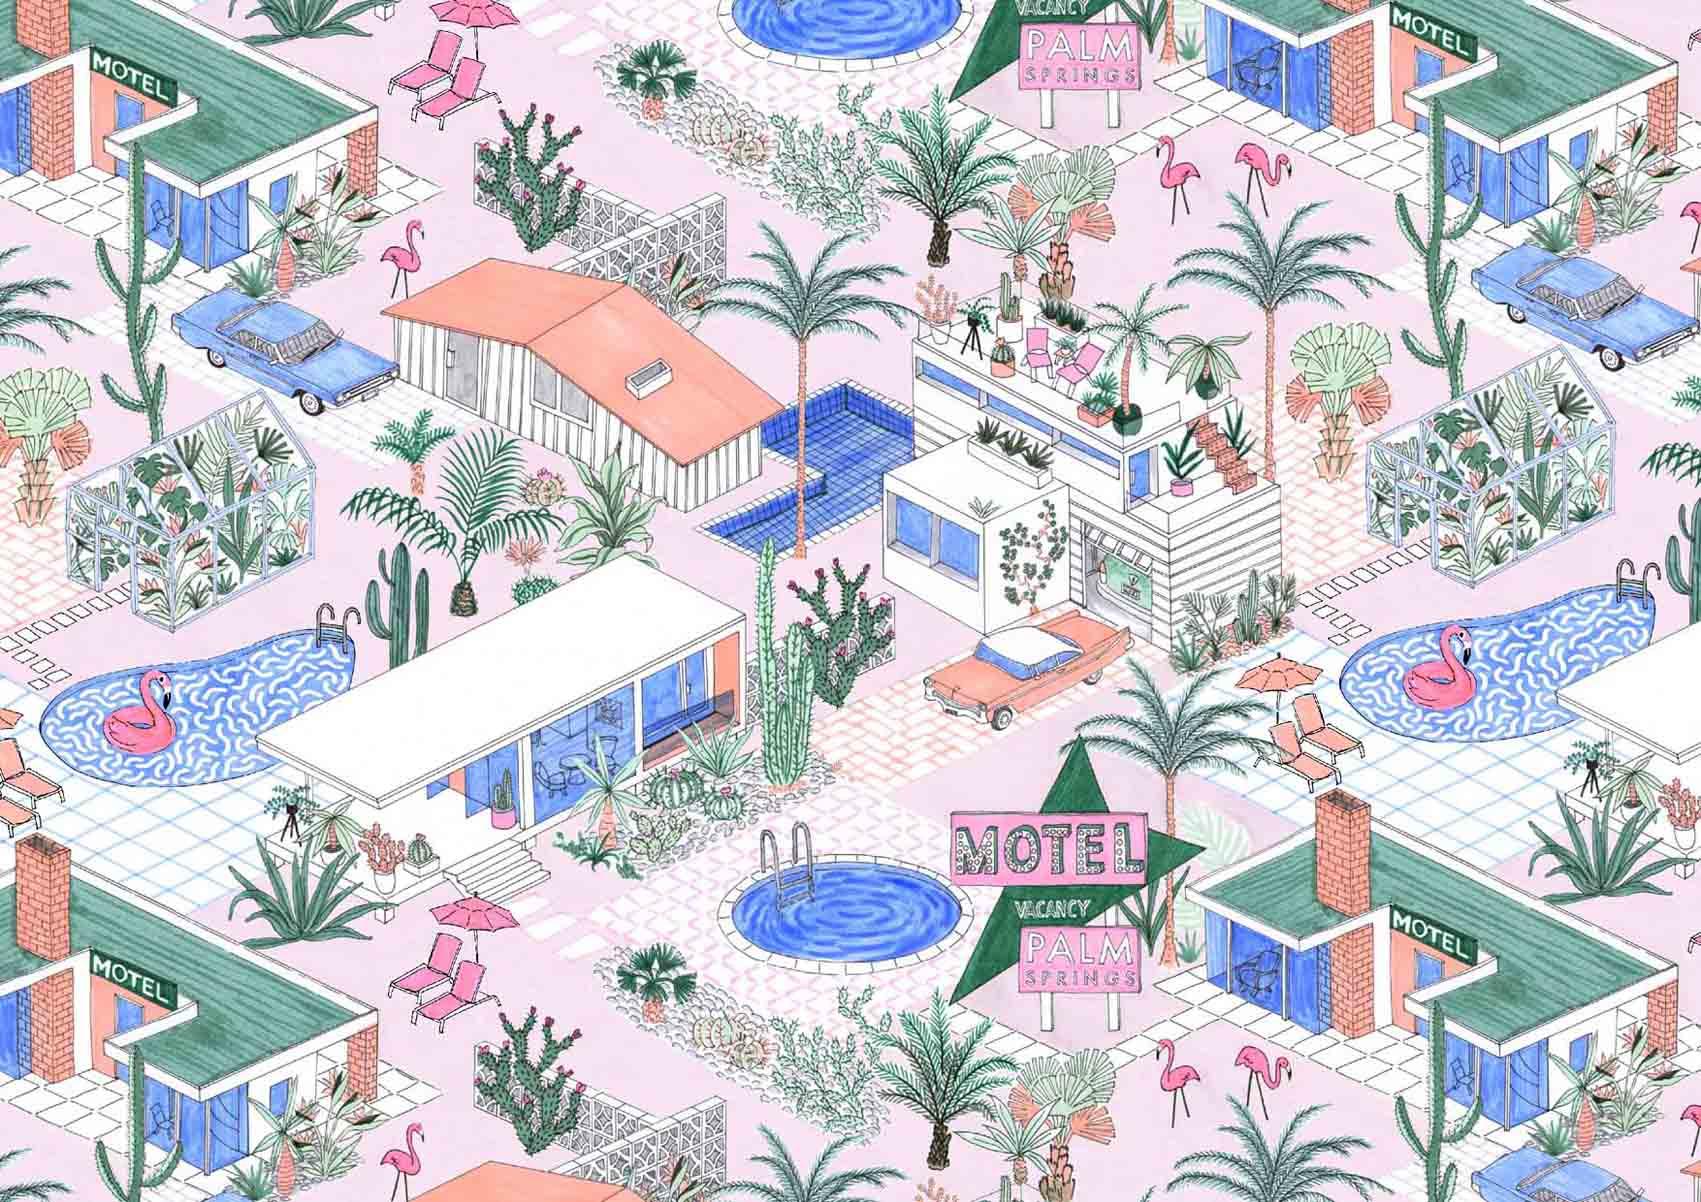 Palm-Springs-Print-Surface-Pattern-Design-1-pink-sm.jpg